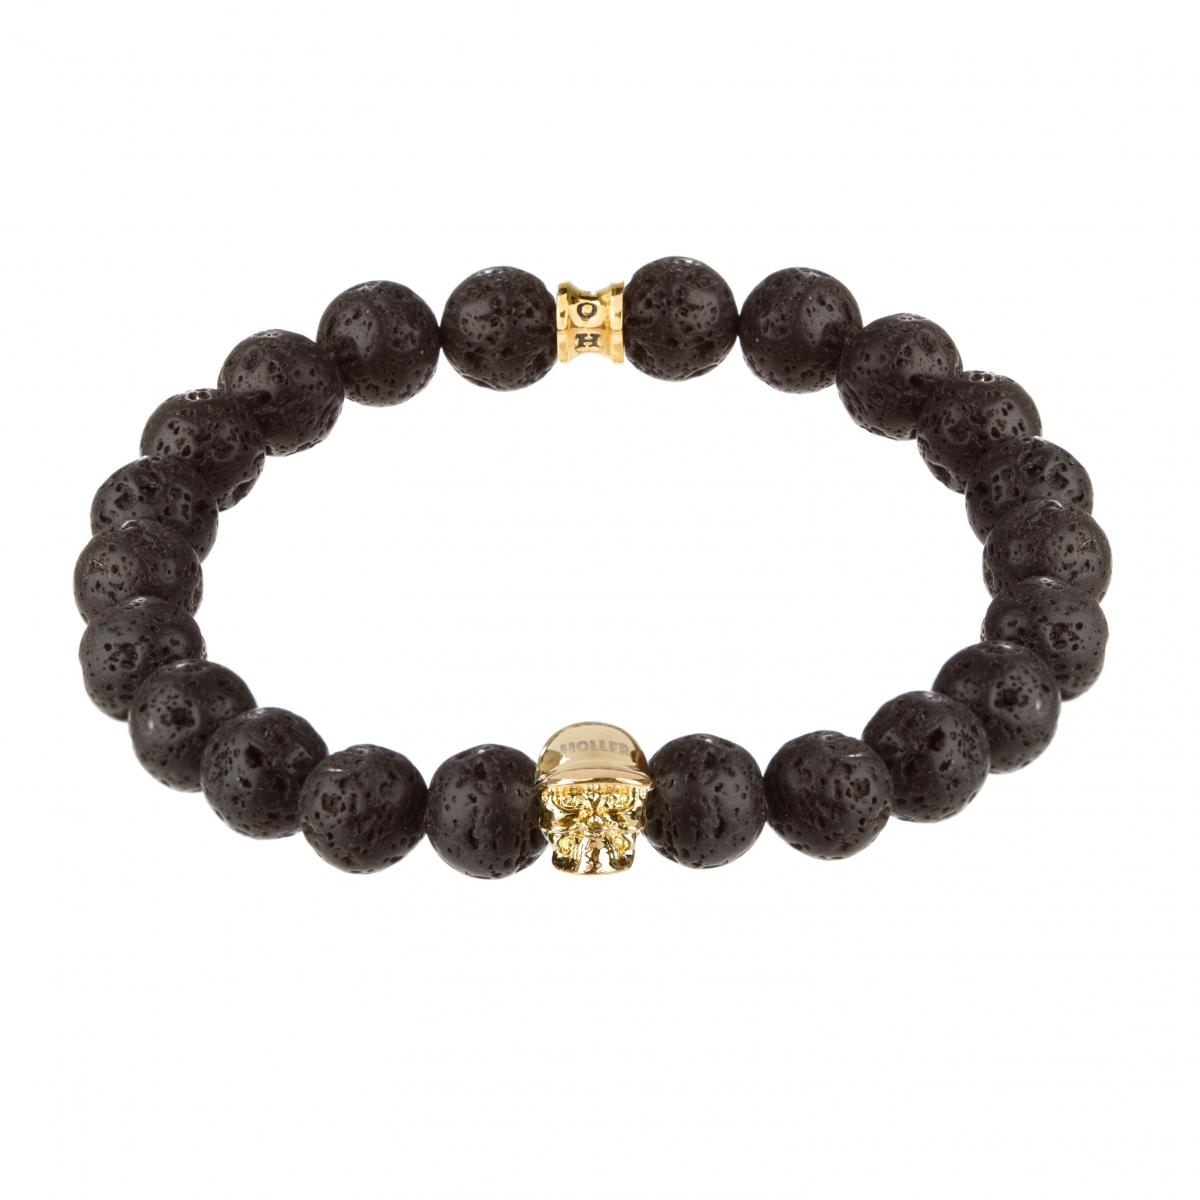 Jefferson Gold Polished Skull / 10mm Lava Rock Natural Stone Bracelet